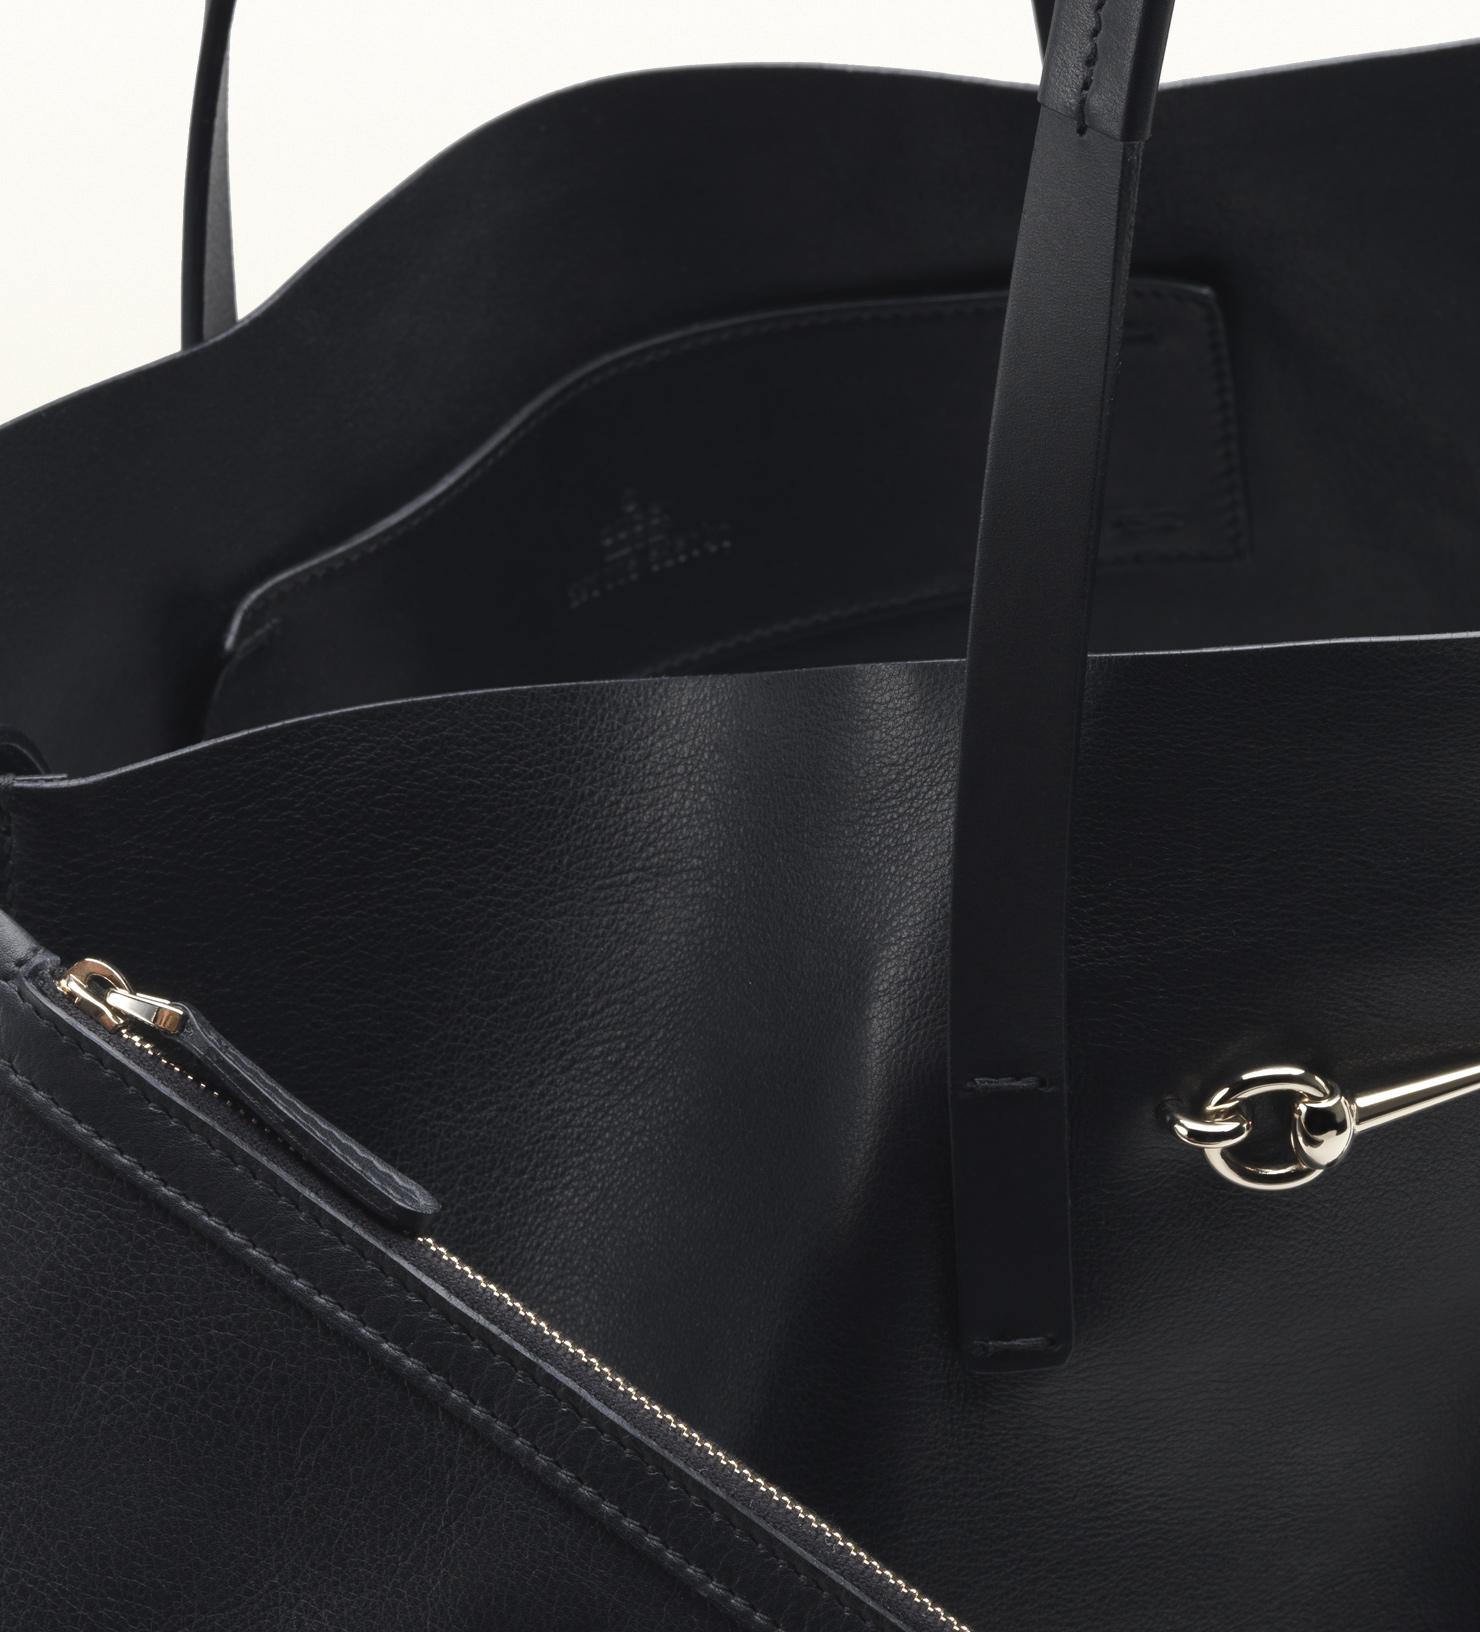 92ca2731253 Lyst - Gucci Park Avenue Leather Horsebit Tote in Black